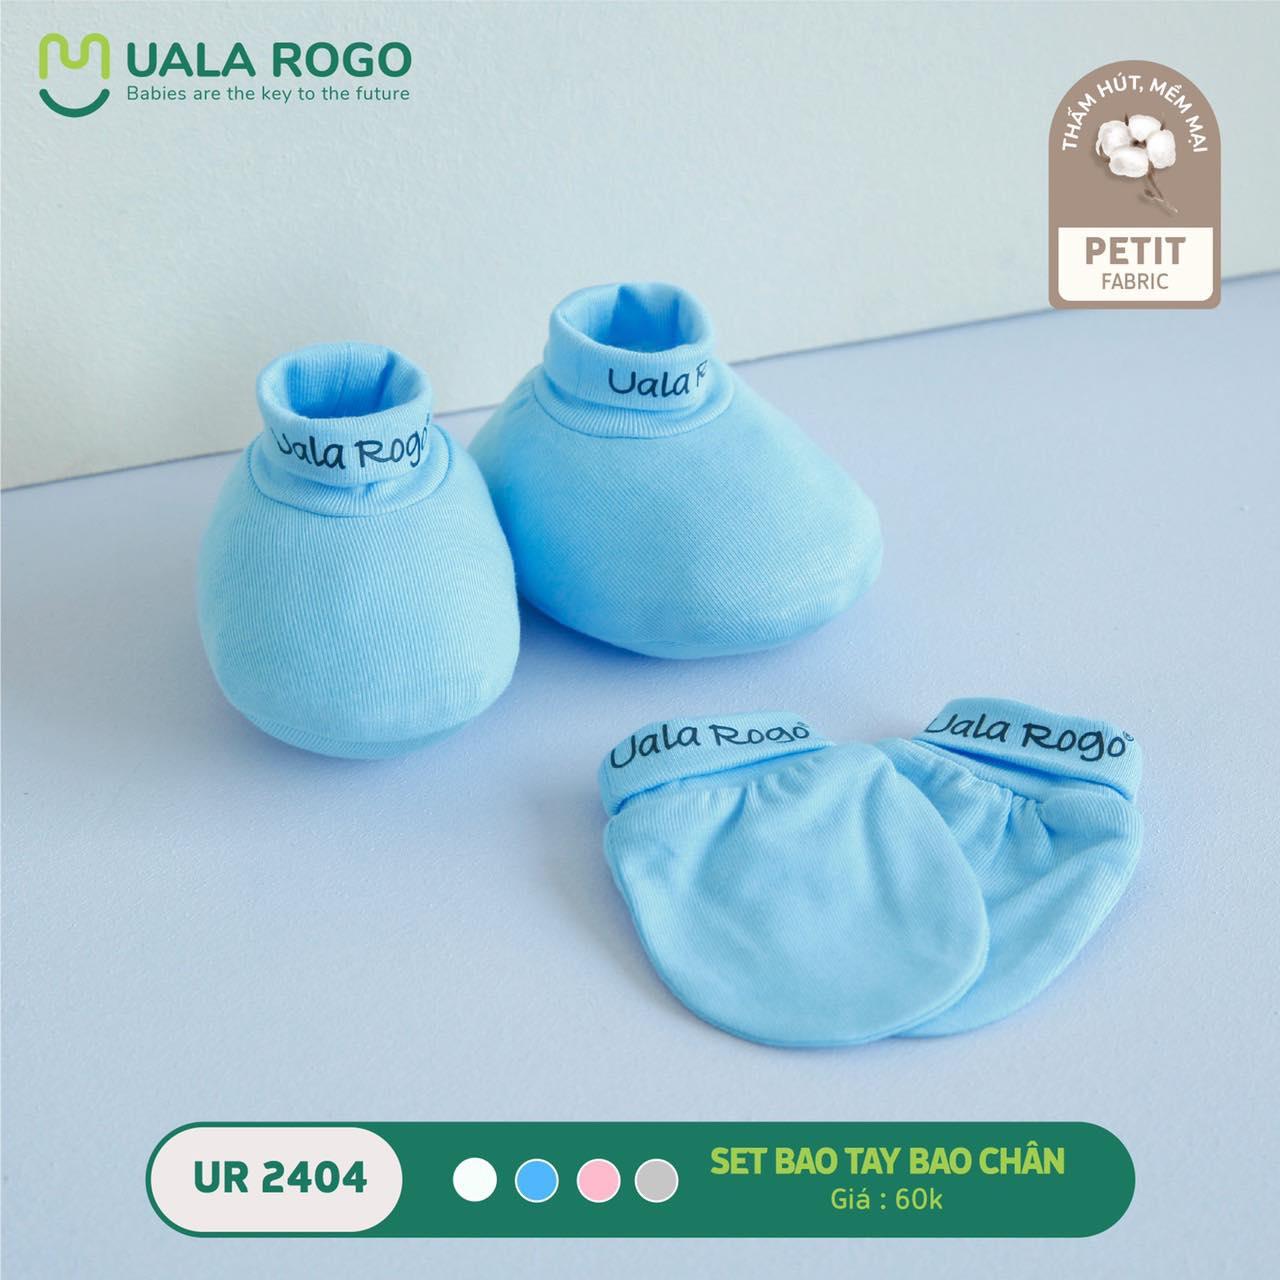 Set bao tay chân Ualarogo Petit màu trơn